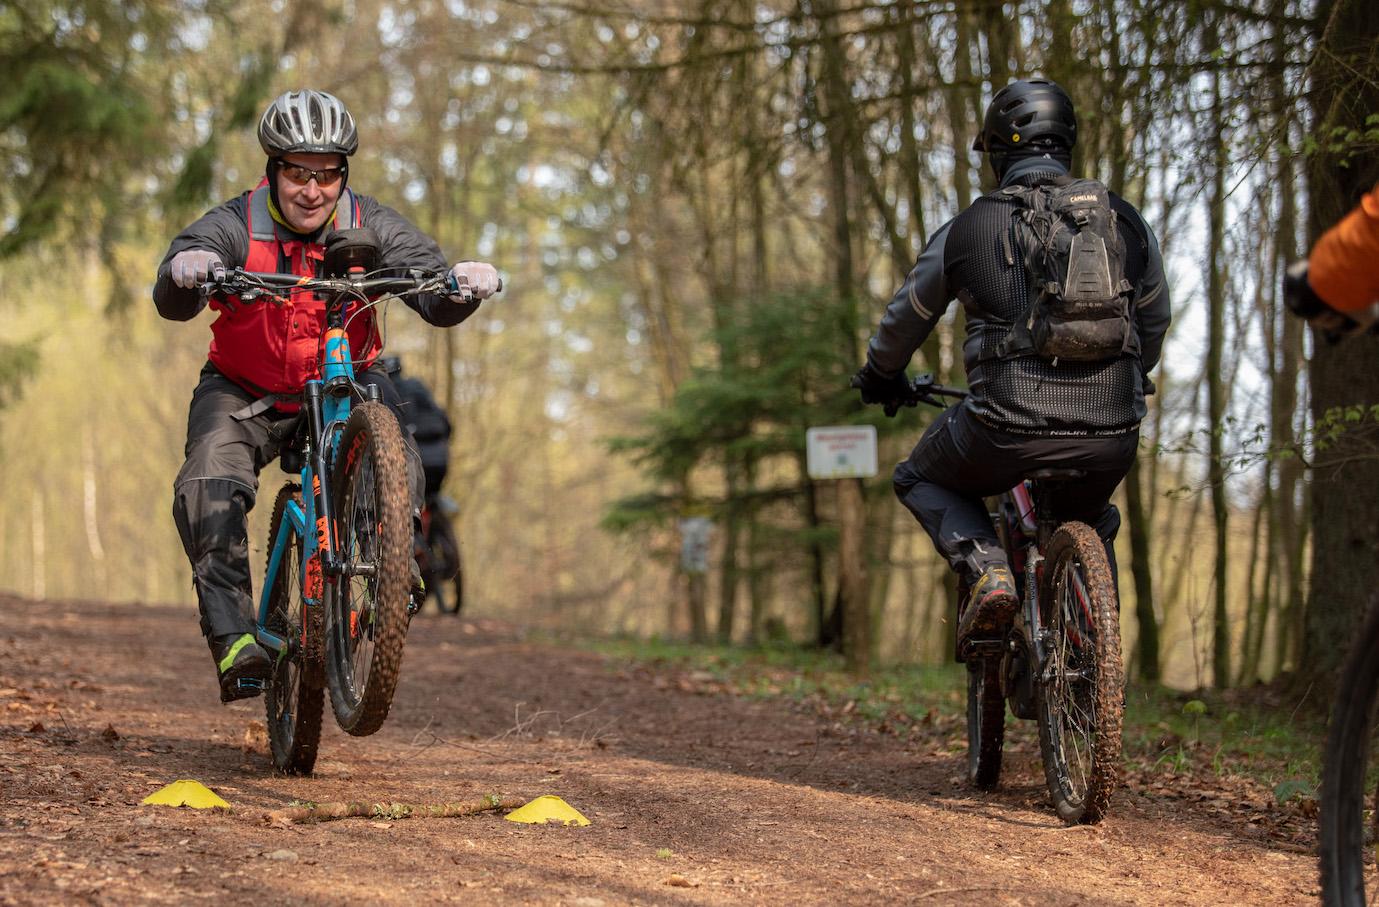 eMTB Fortgeschritten Fahrtechnik Kurs in Sasbachwalden - Rock my Trail Bikeschule